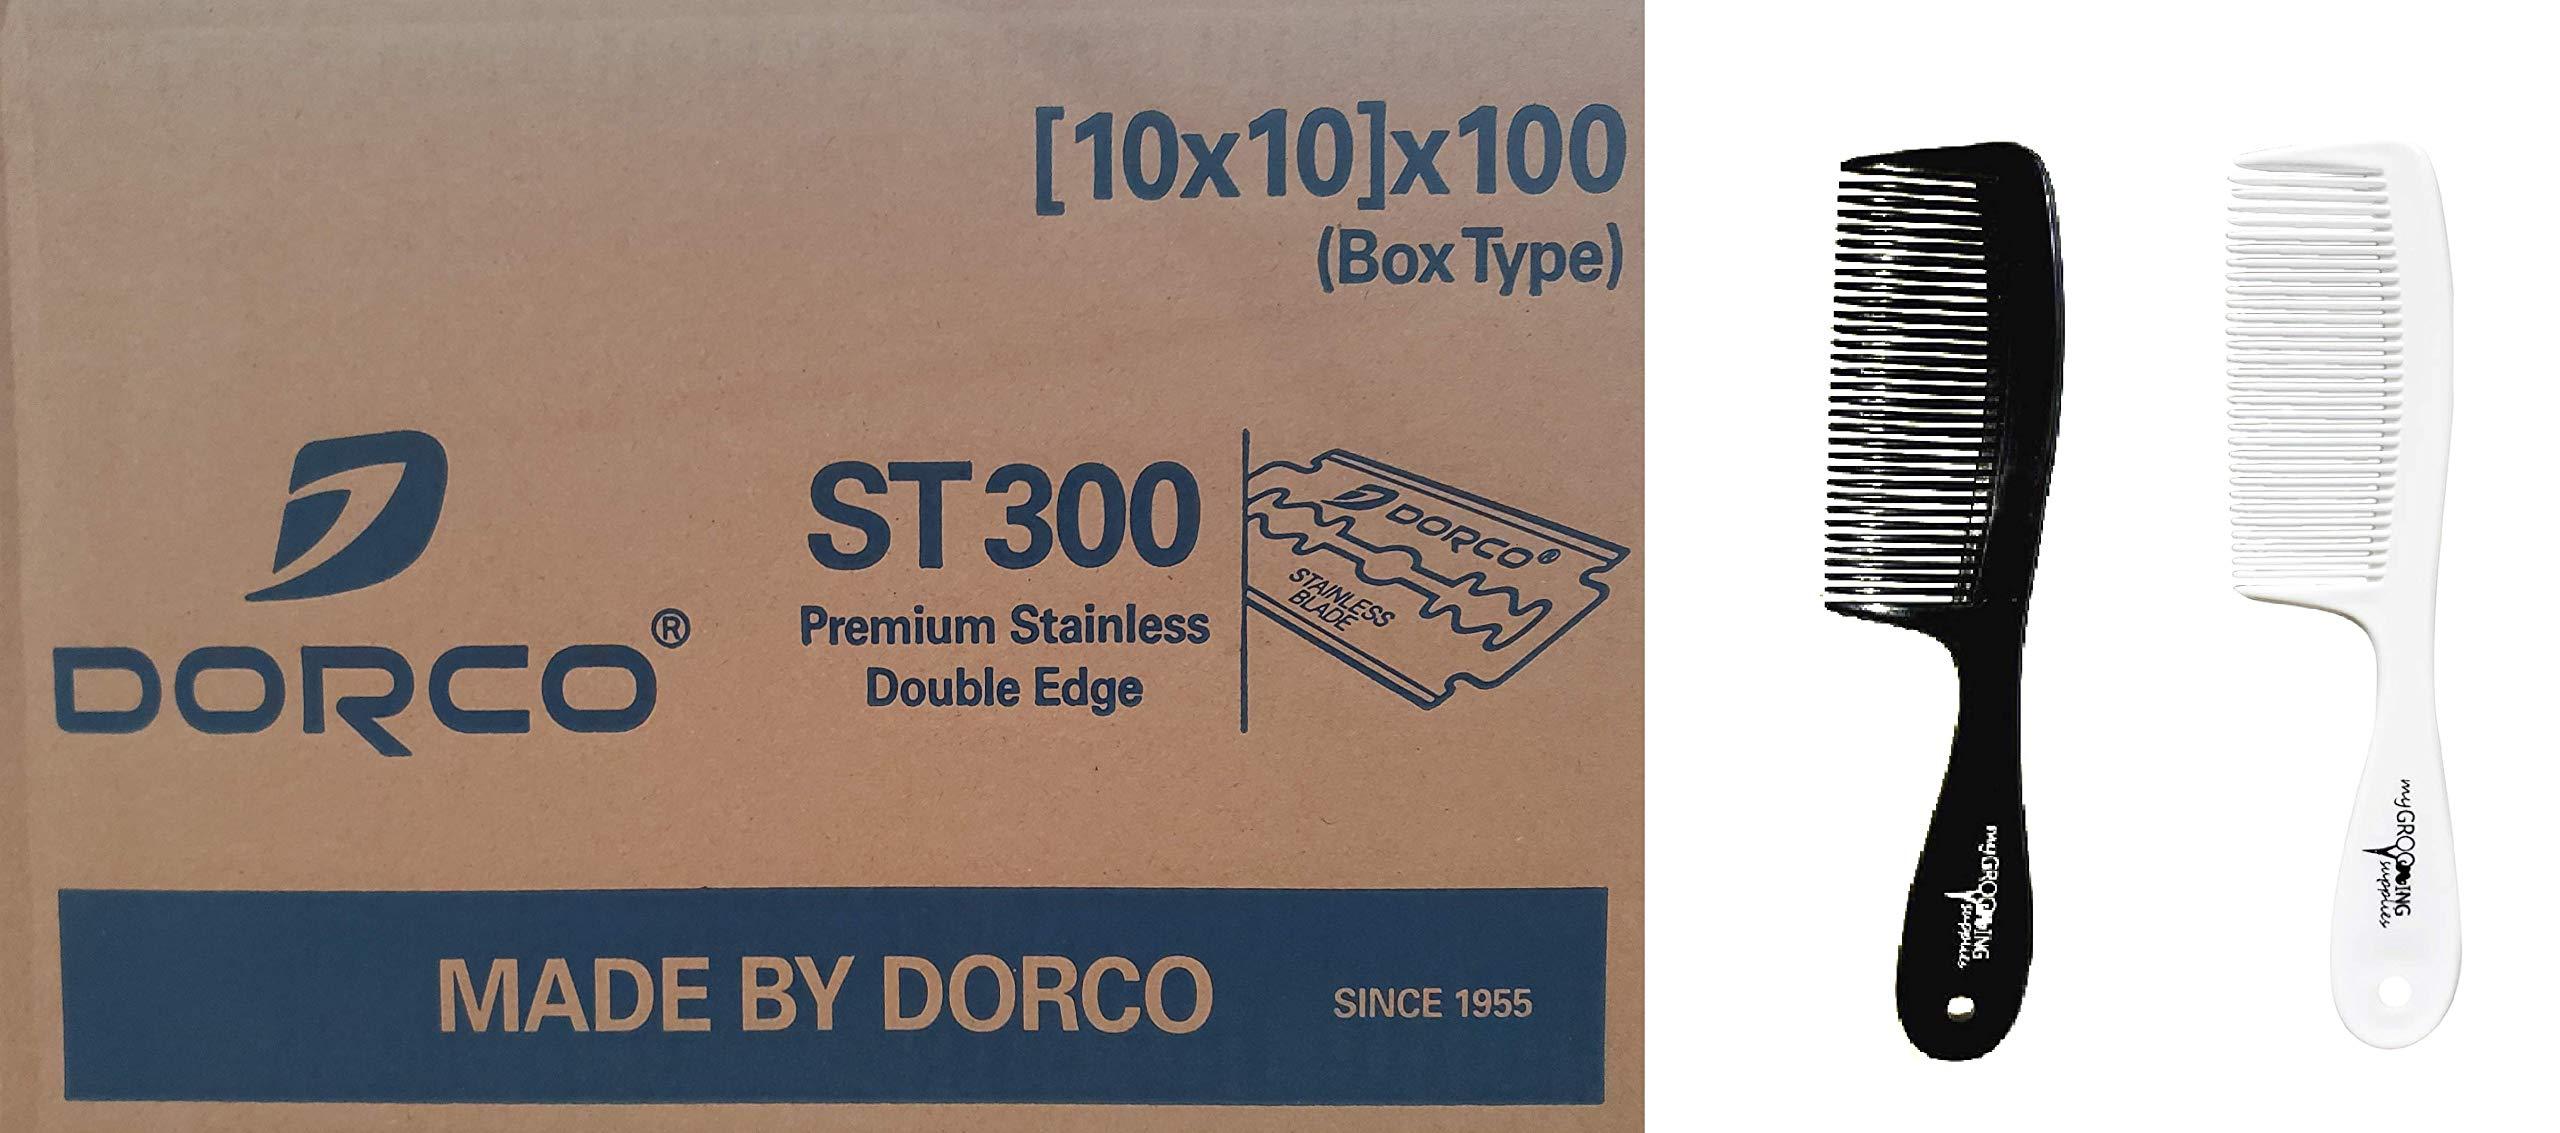 MGS Bundle 10,000 Dorco ST300 Blades & 2 MGS Combs by MyGroomingSupplies